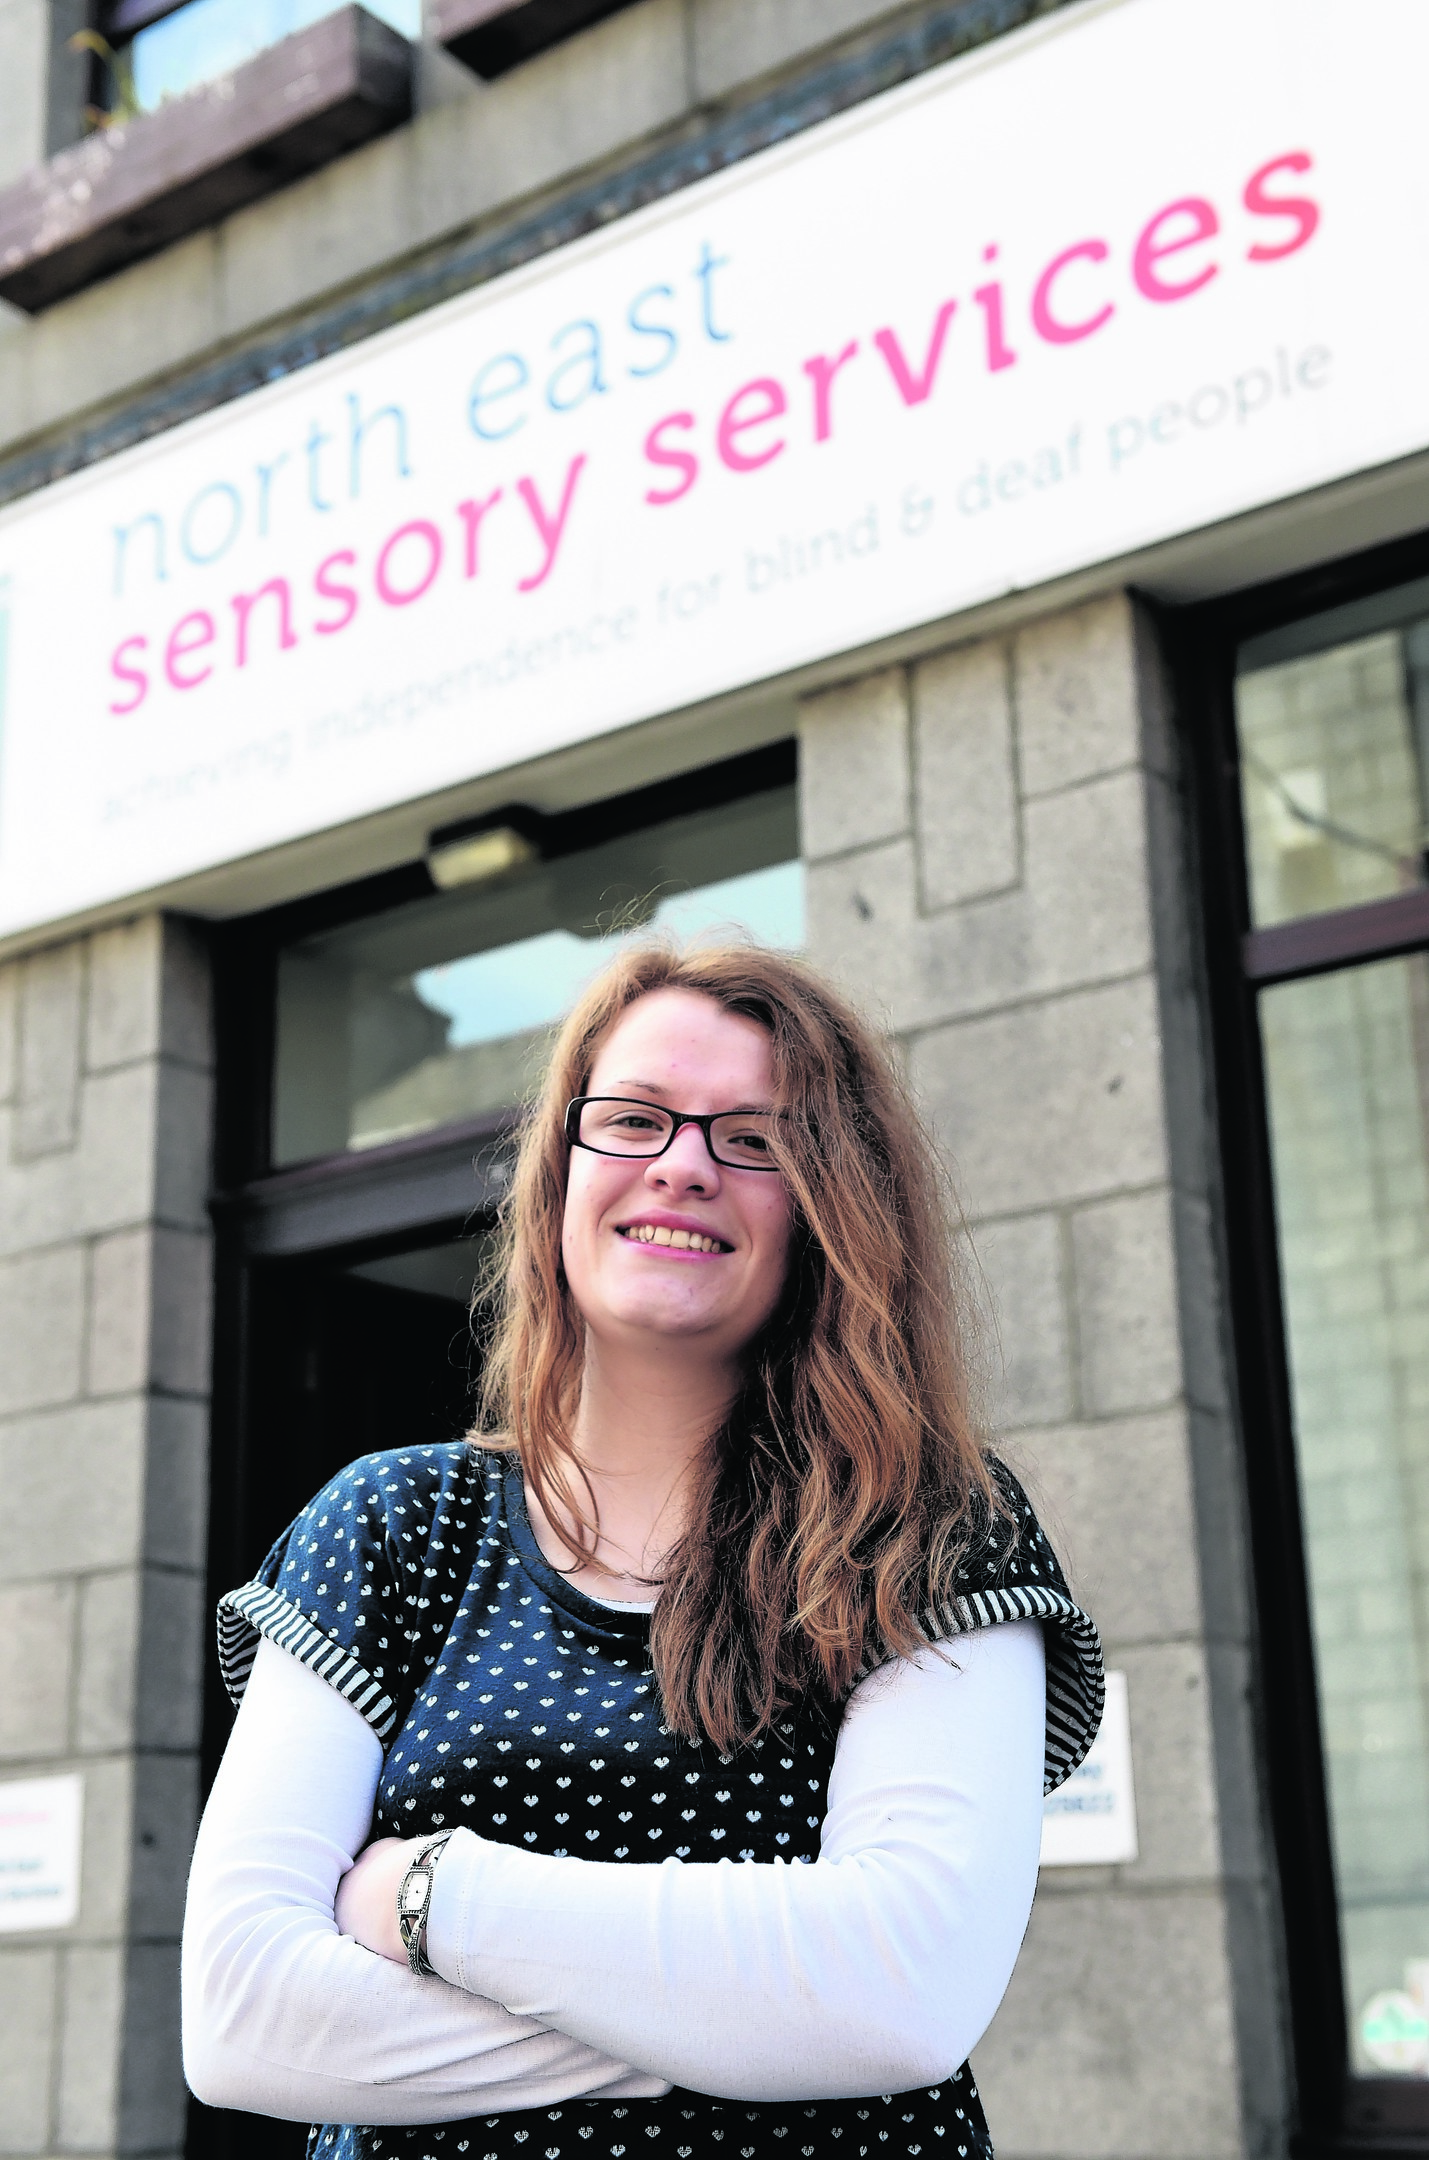 Leona Glennie, who works at North East Sensory Services.